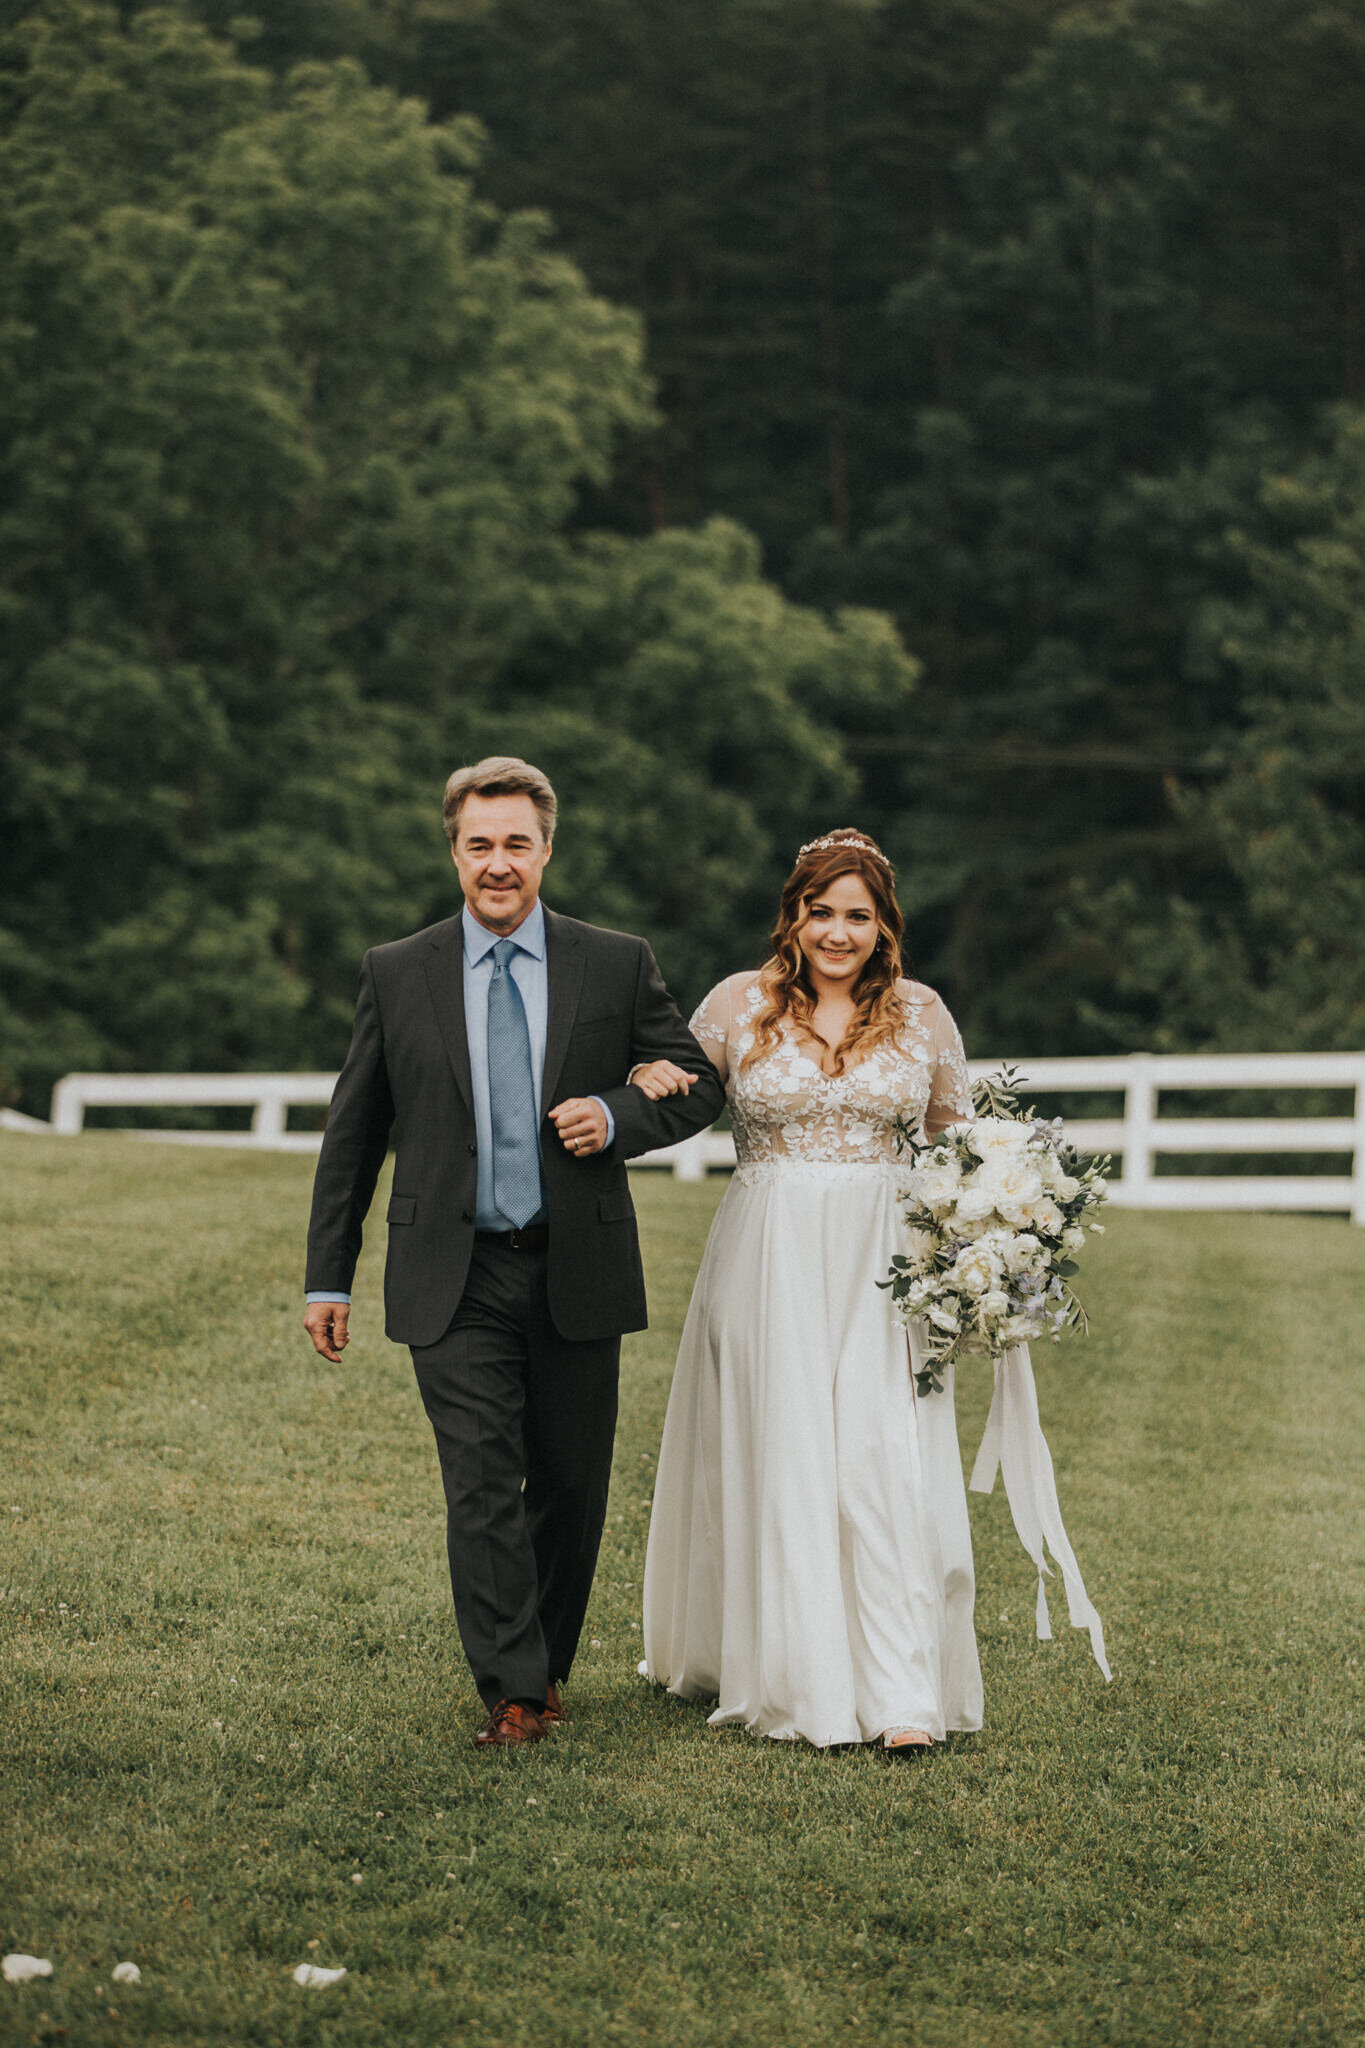 KateMatt-North-Georgia-Wedding-Photographer-Mountain-Laurel-Farm-98.jpg